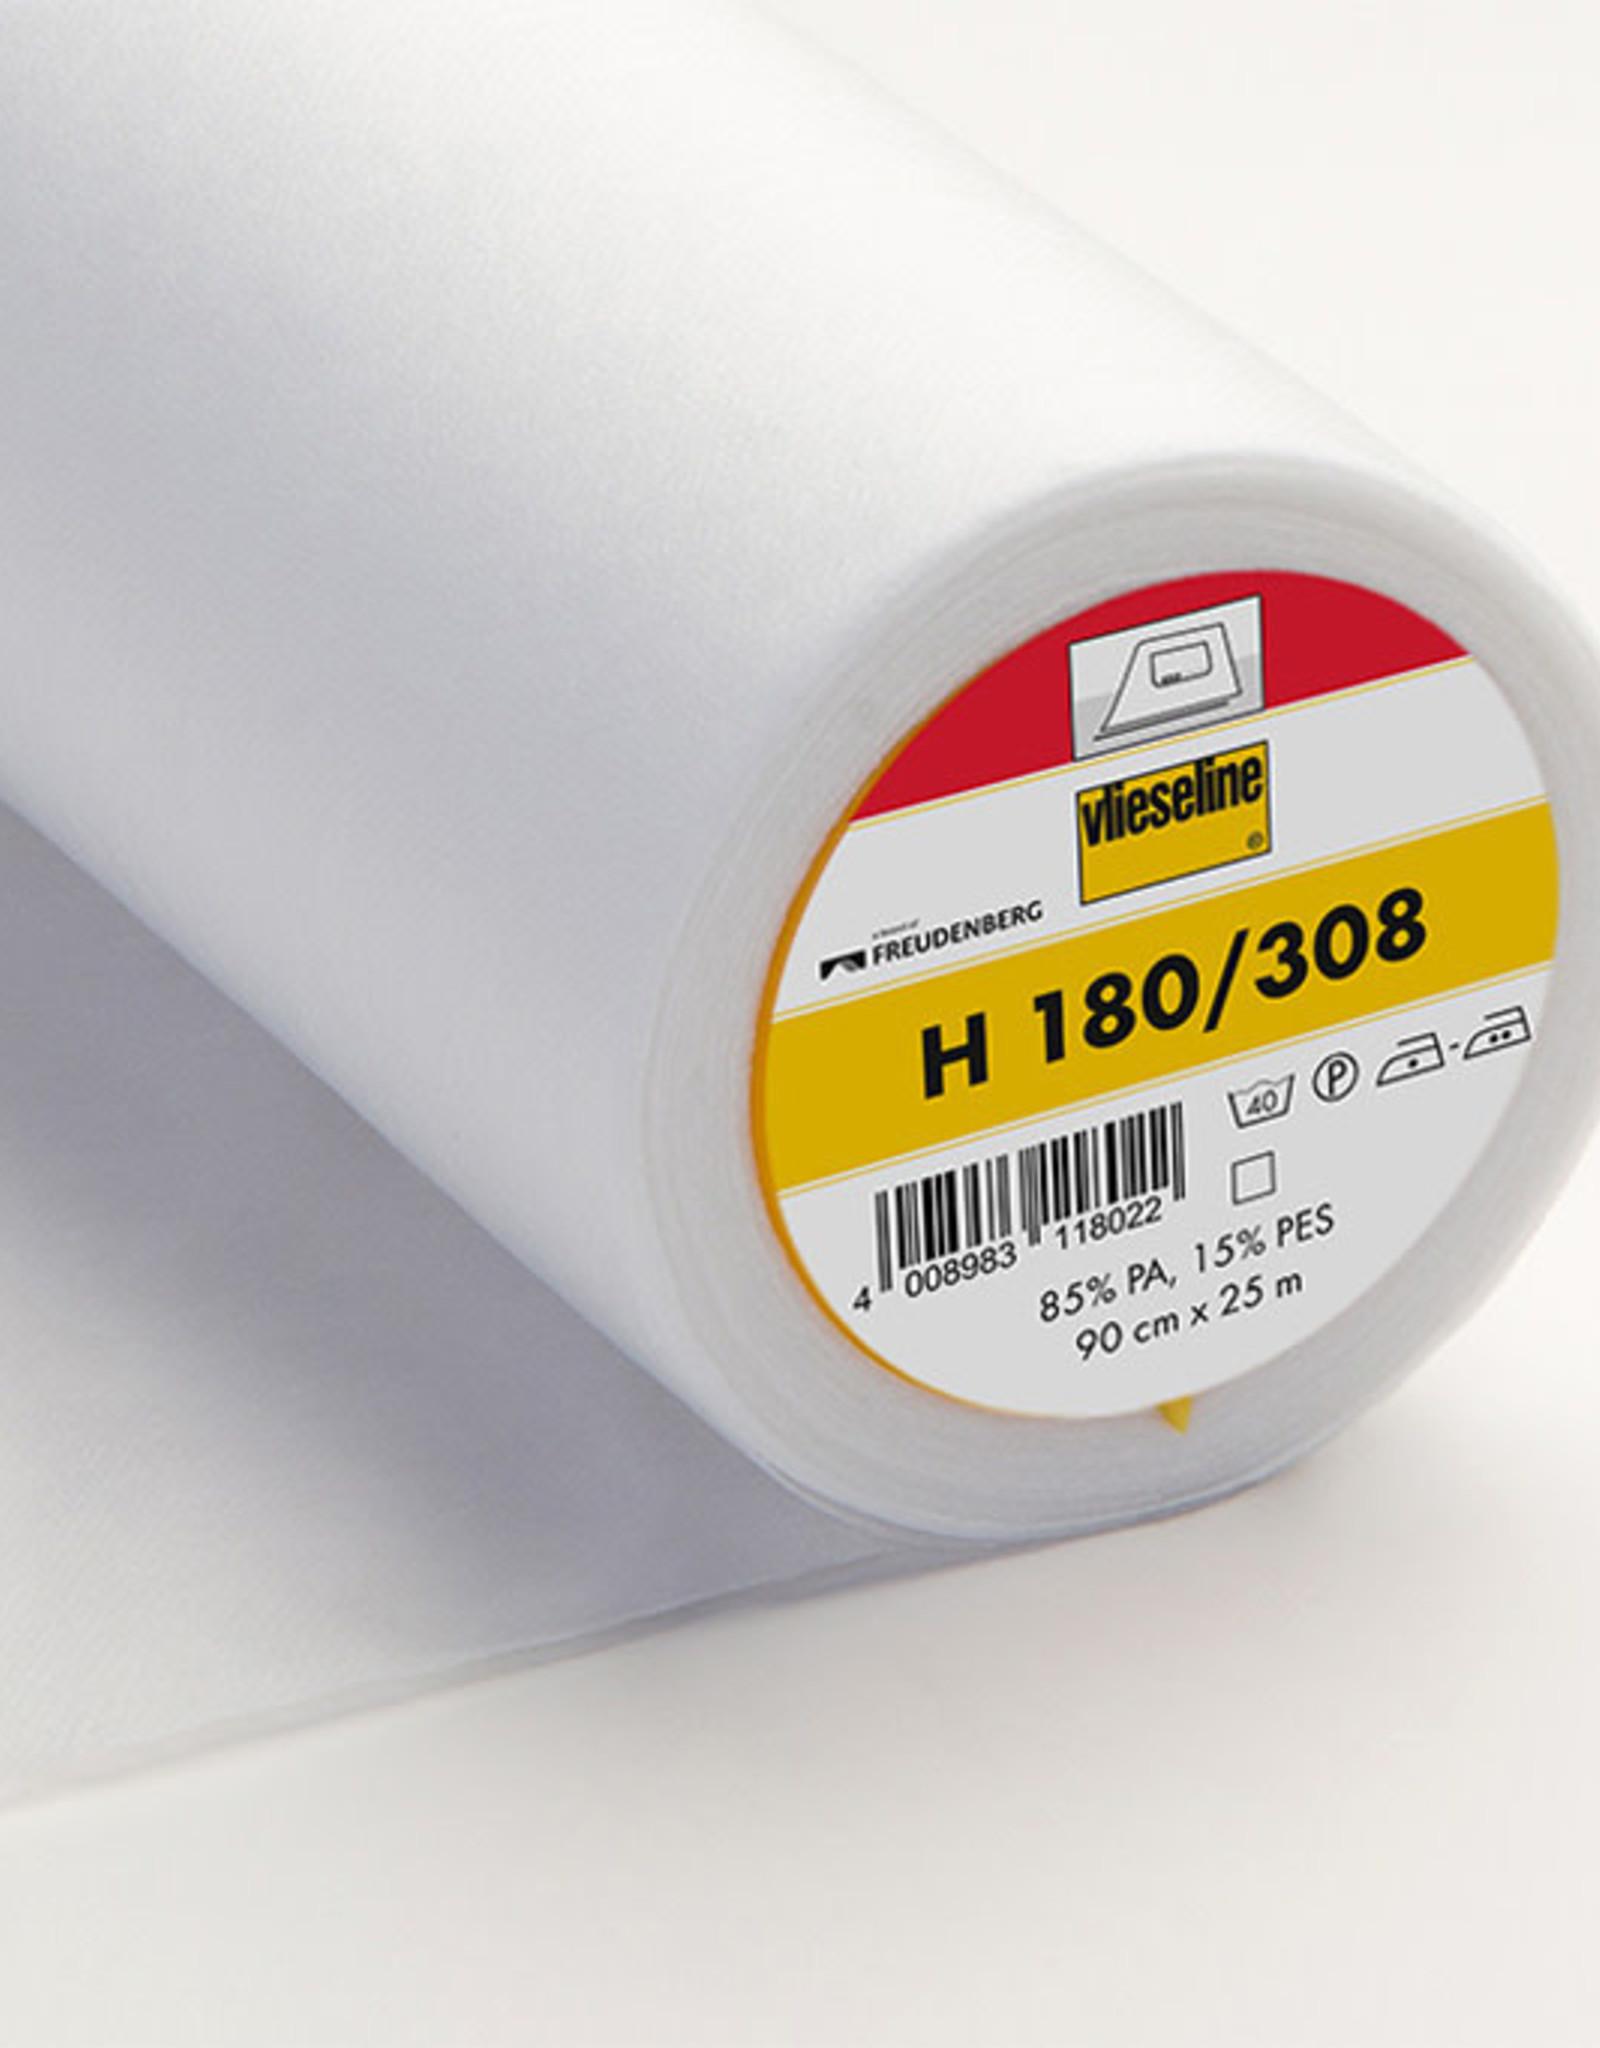 Vlieseline Vlieseline H 180 plakbare tussenvoering wit 90 cm